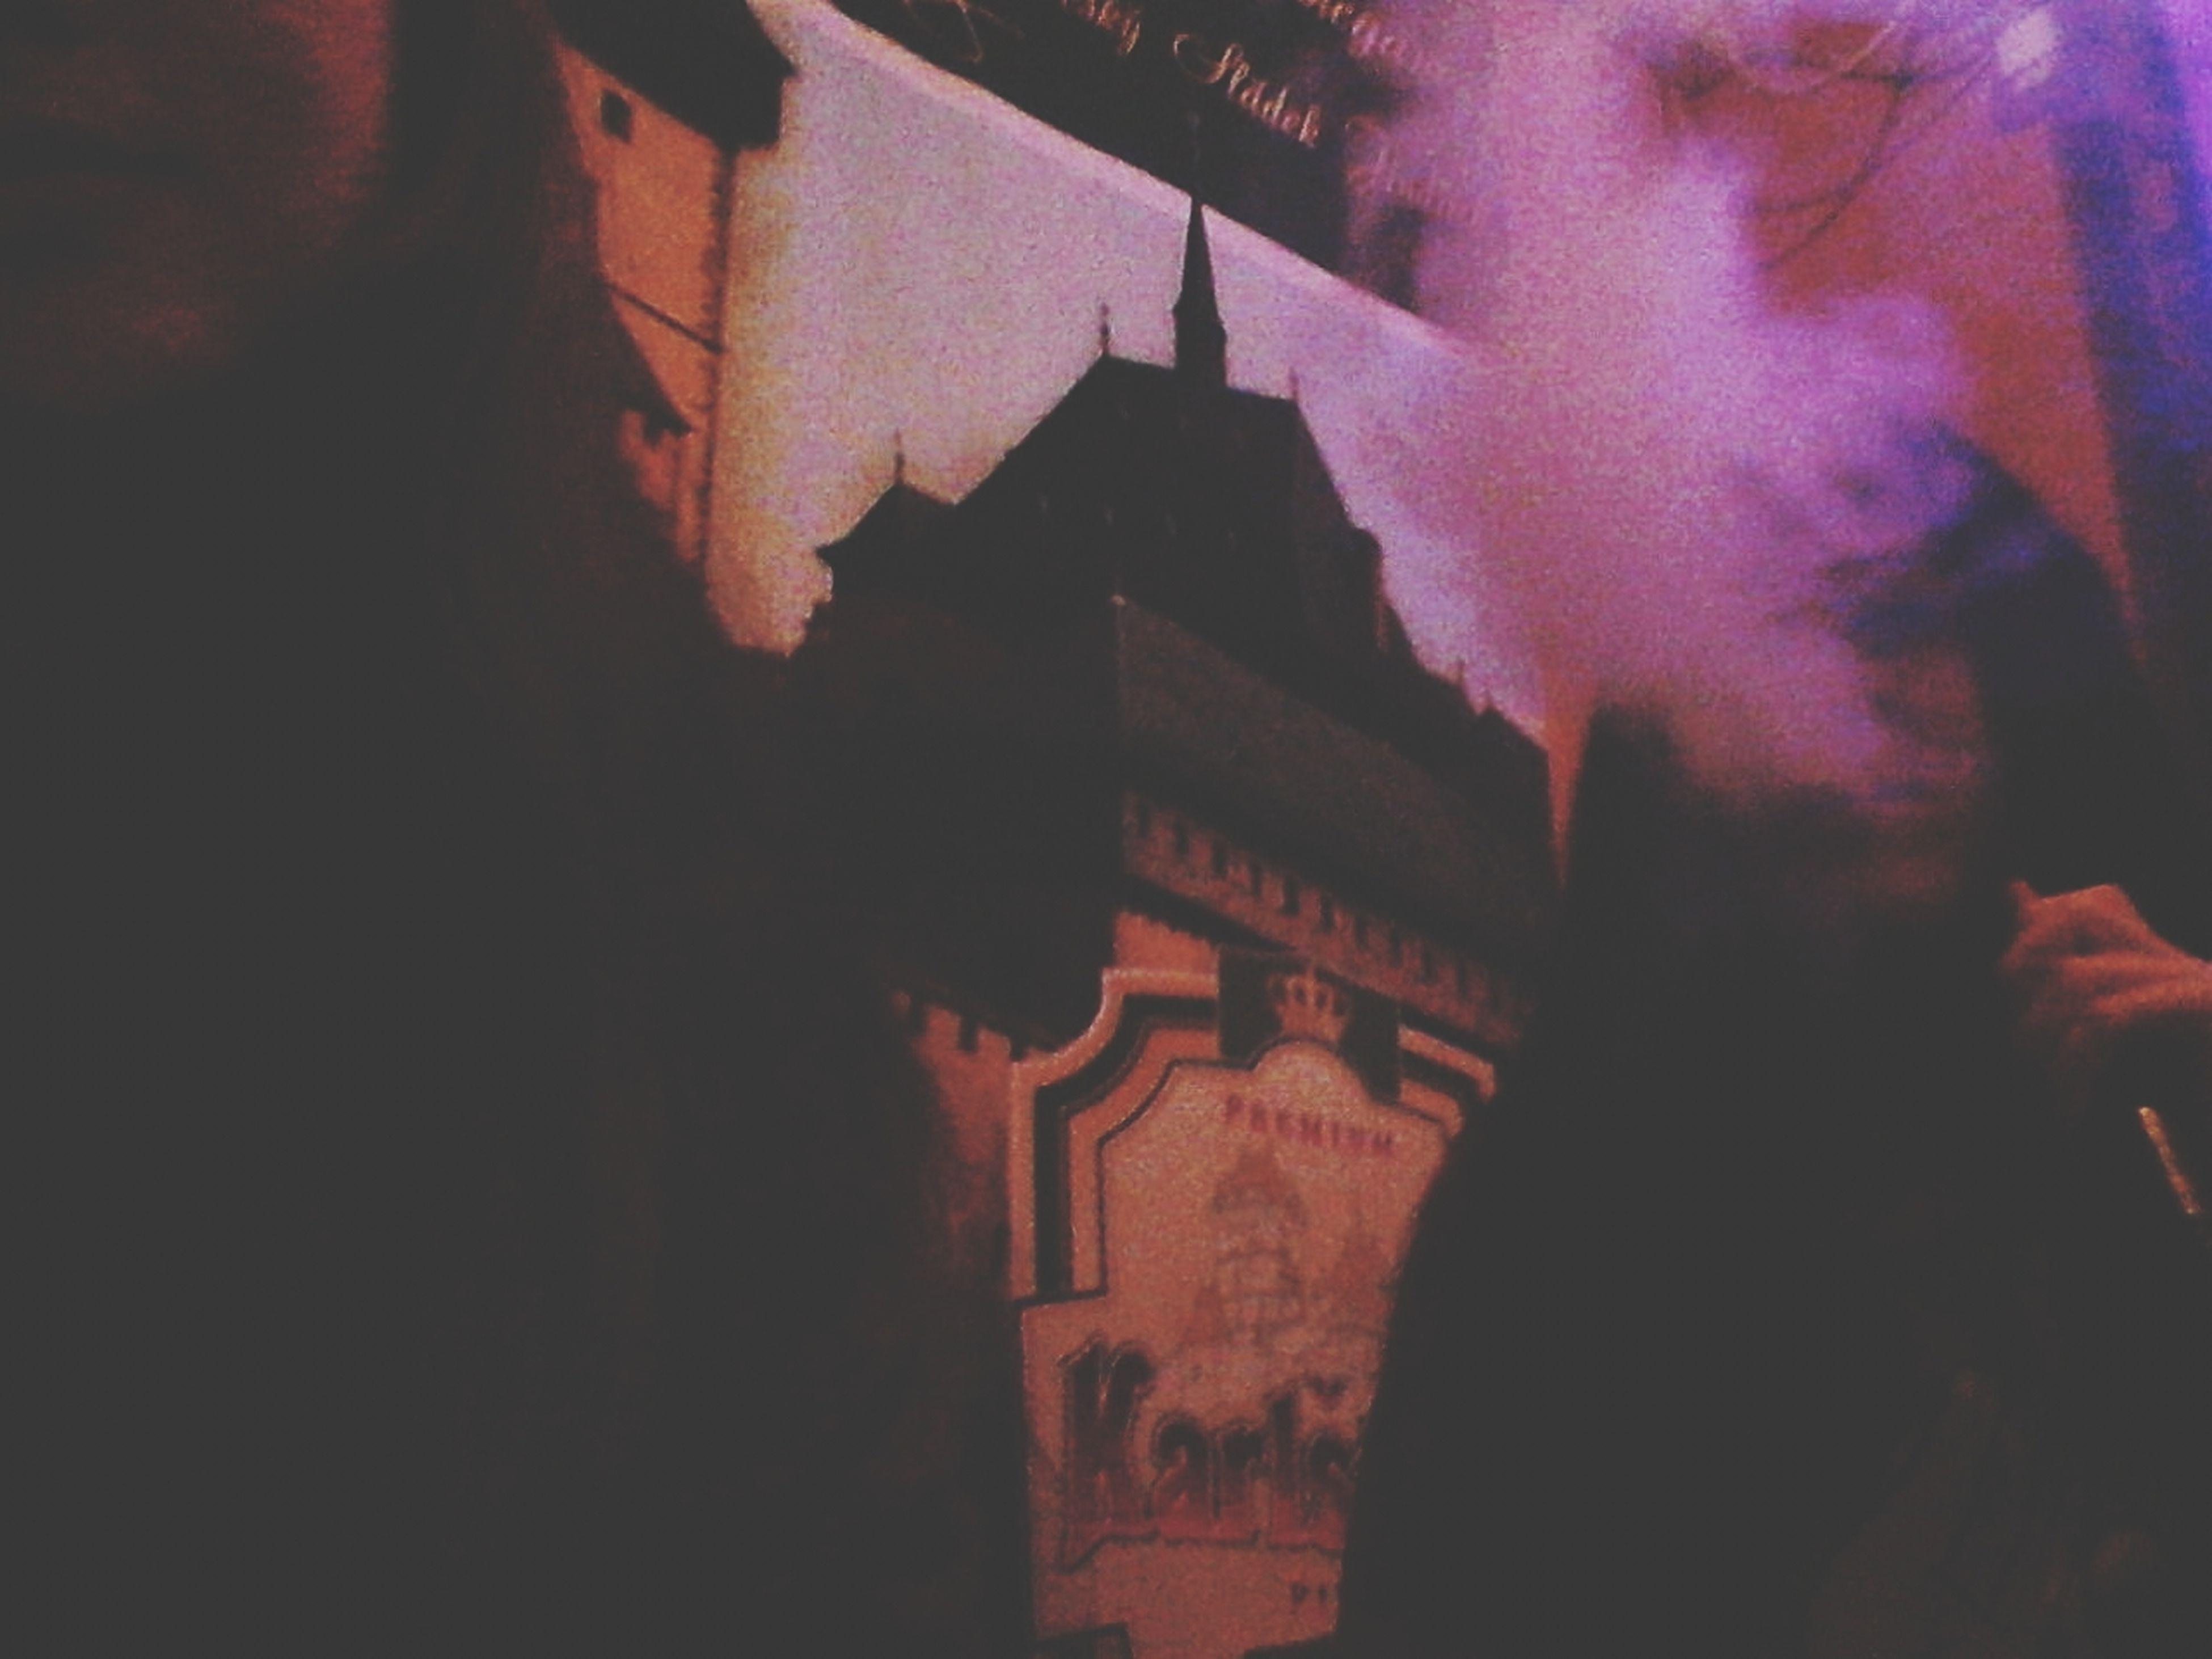 architecture, built structure, building exterior, night, illuminated, art, lifestyles, leisure activity, religion, art and craft, creativity, men, spirituality, human representation, place of worship, silhouette, outdoors, dark